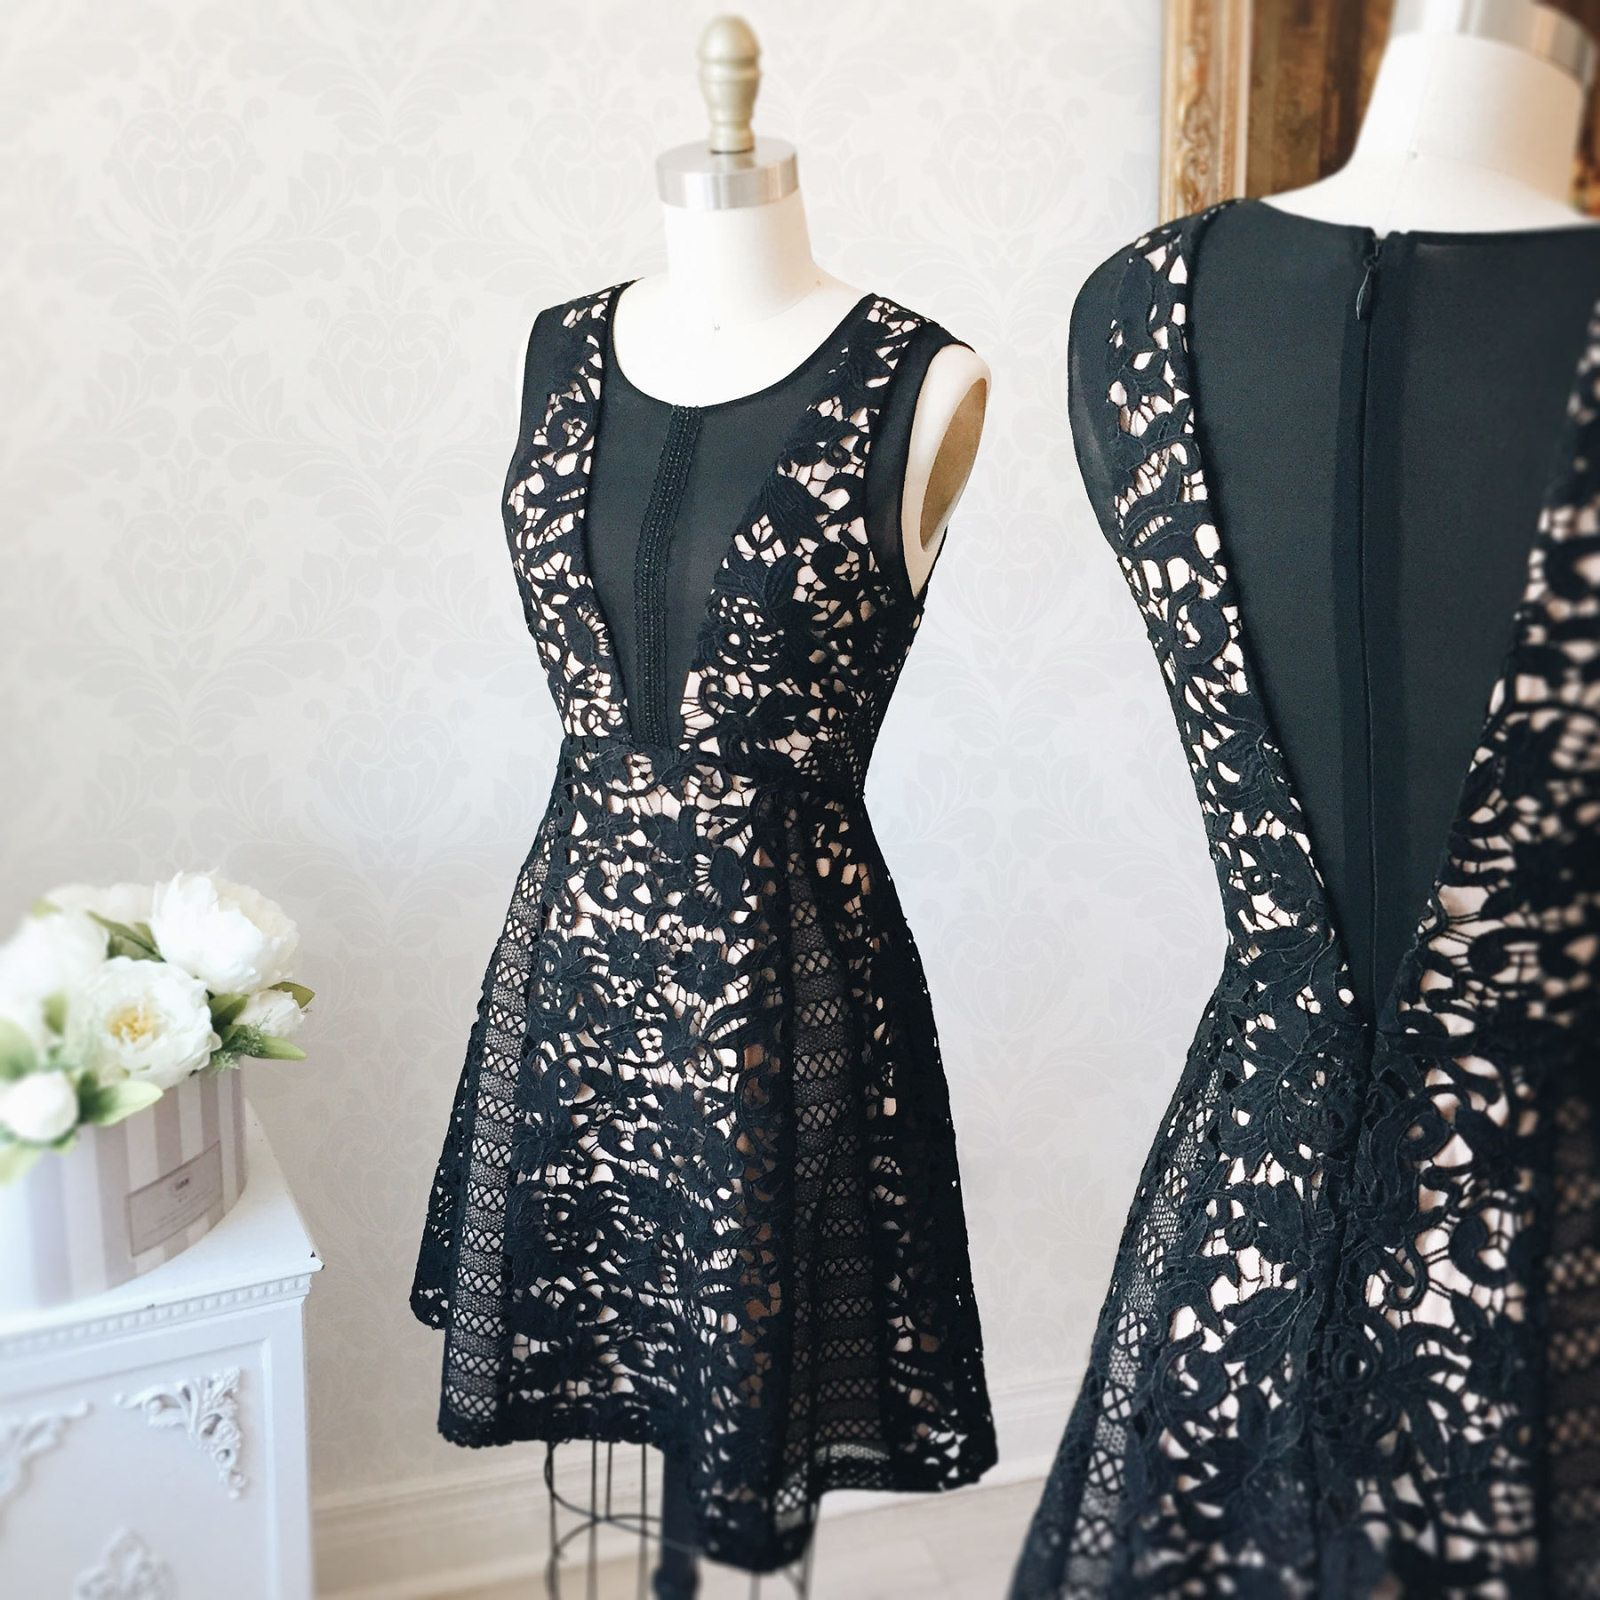 Tally aussi disponible en fuschia estilo pinterest robe prom